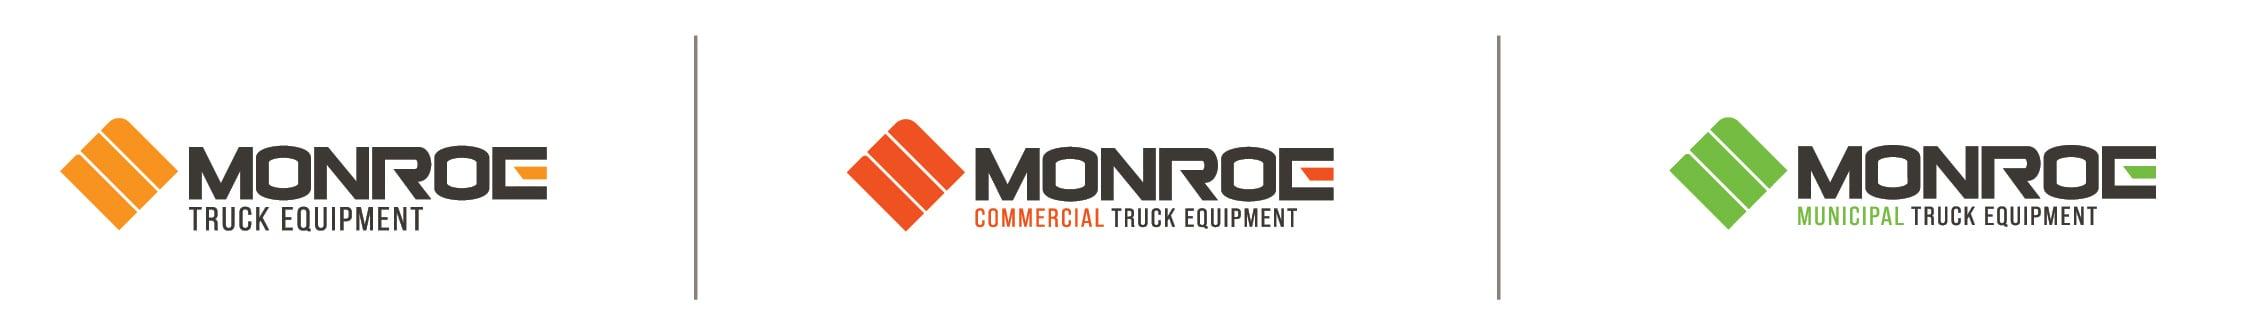 Monroe_Logos_Sidebyside